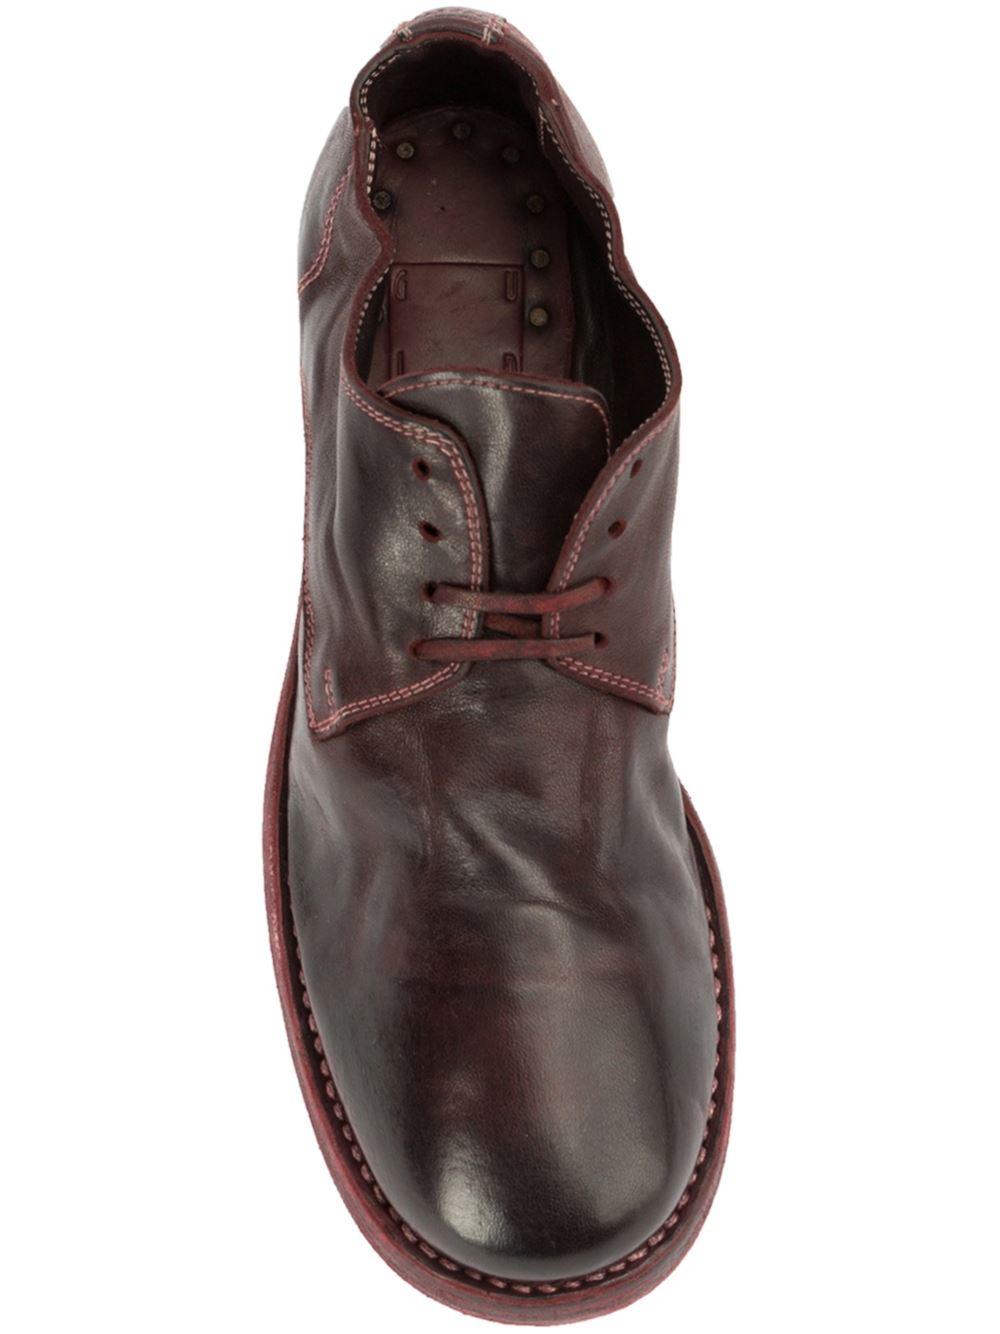 Bucketfeet Shoes Uk